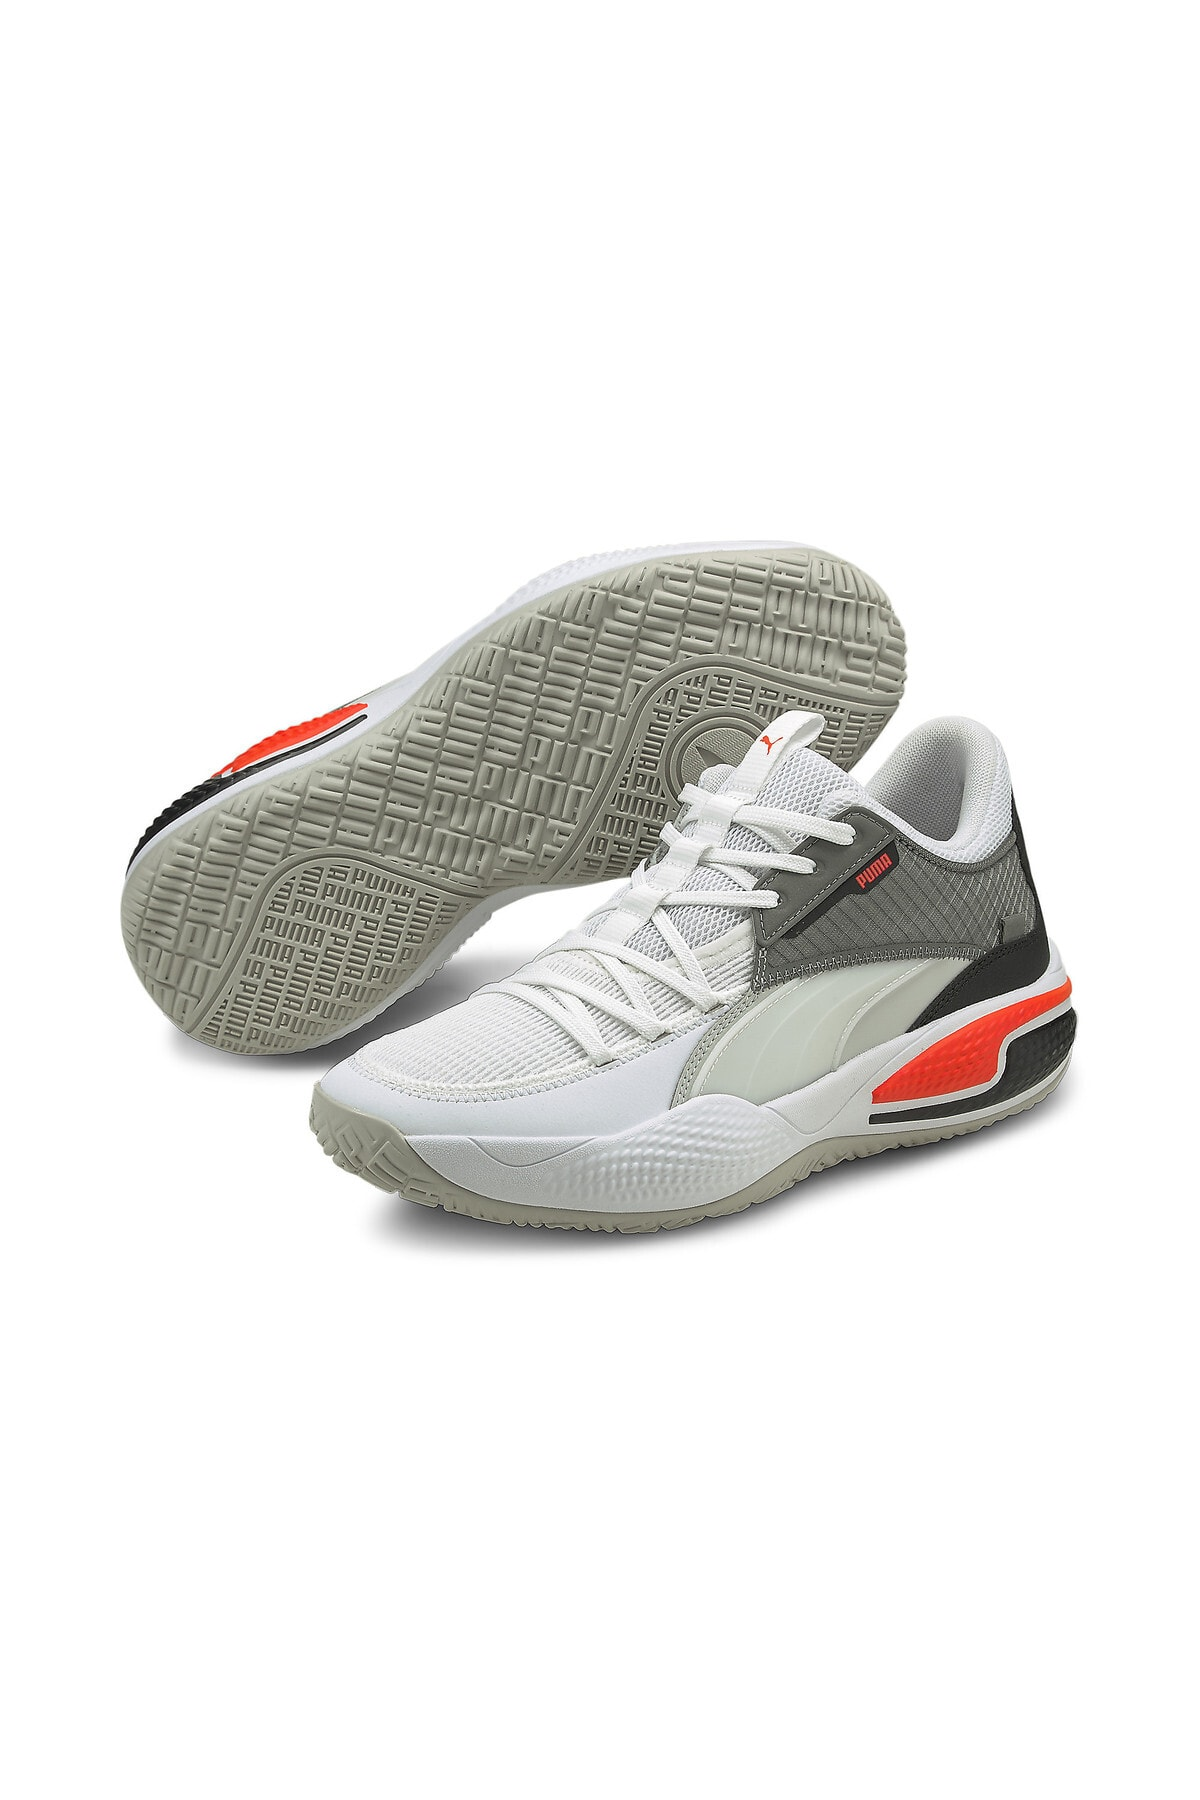 Puma COURT RIDER Basketbol Ayakkabı